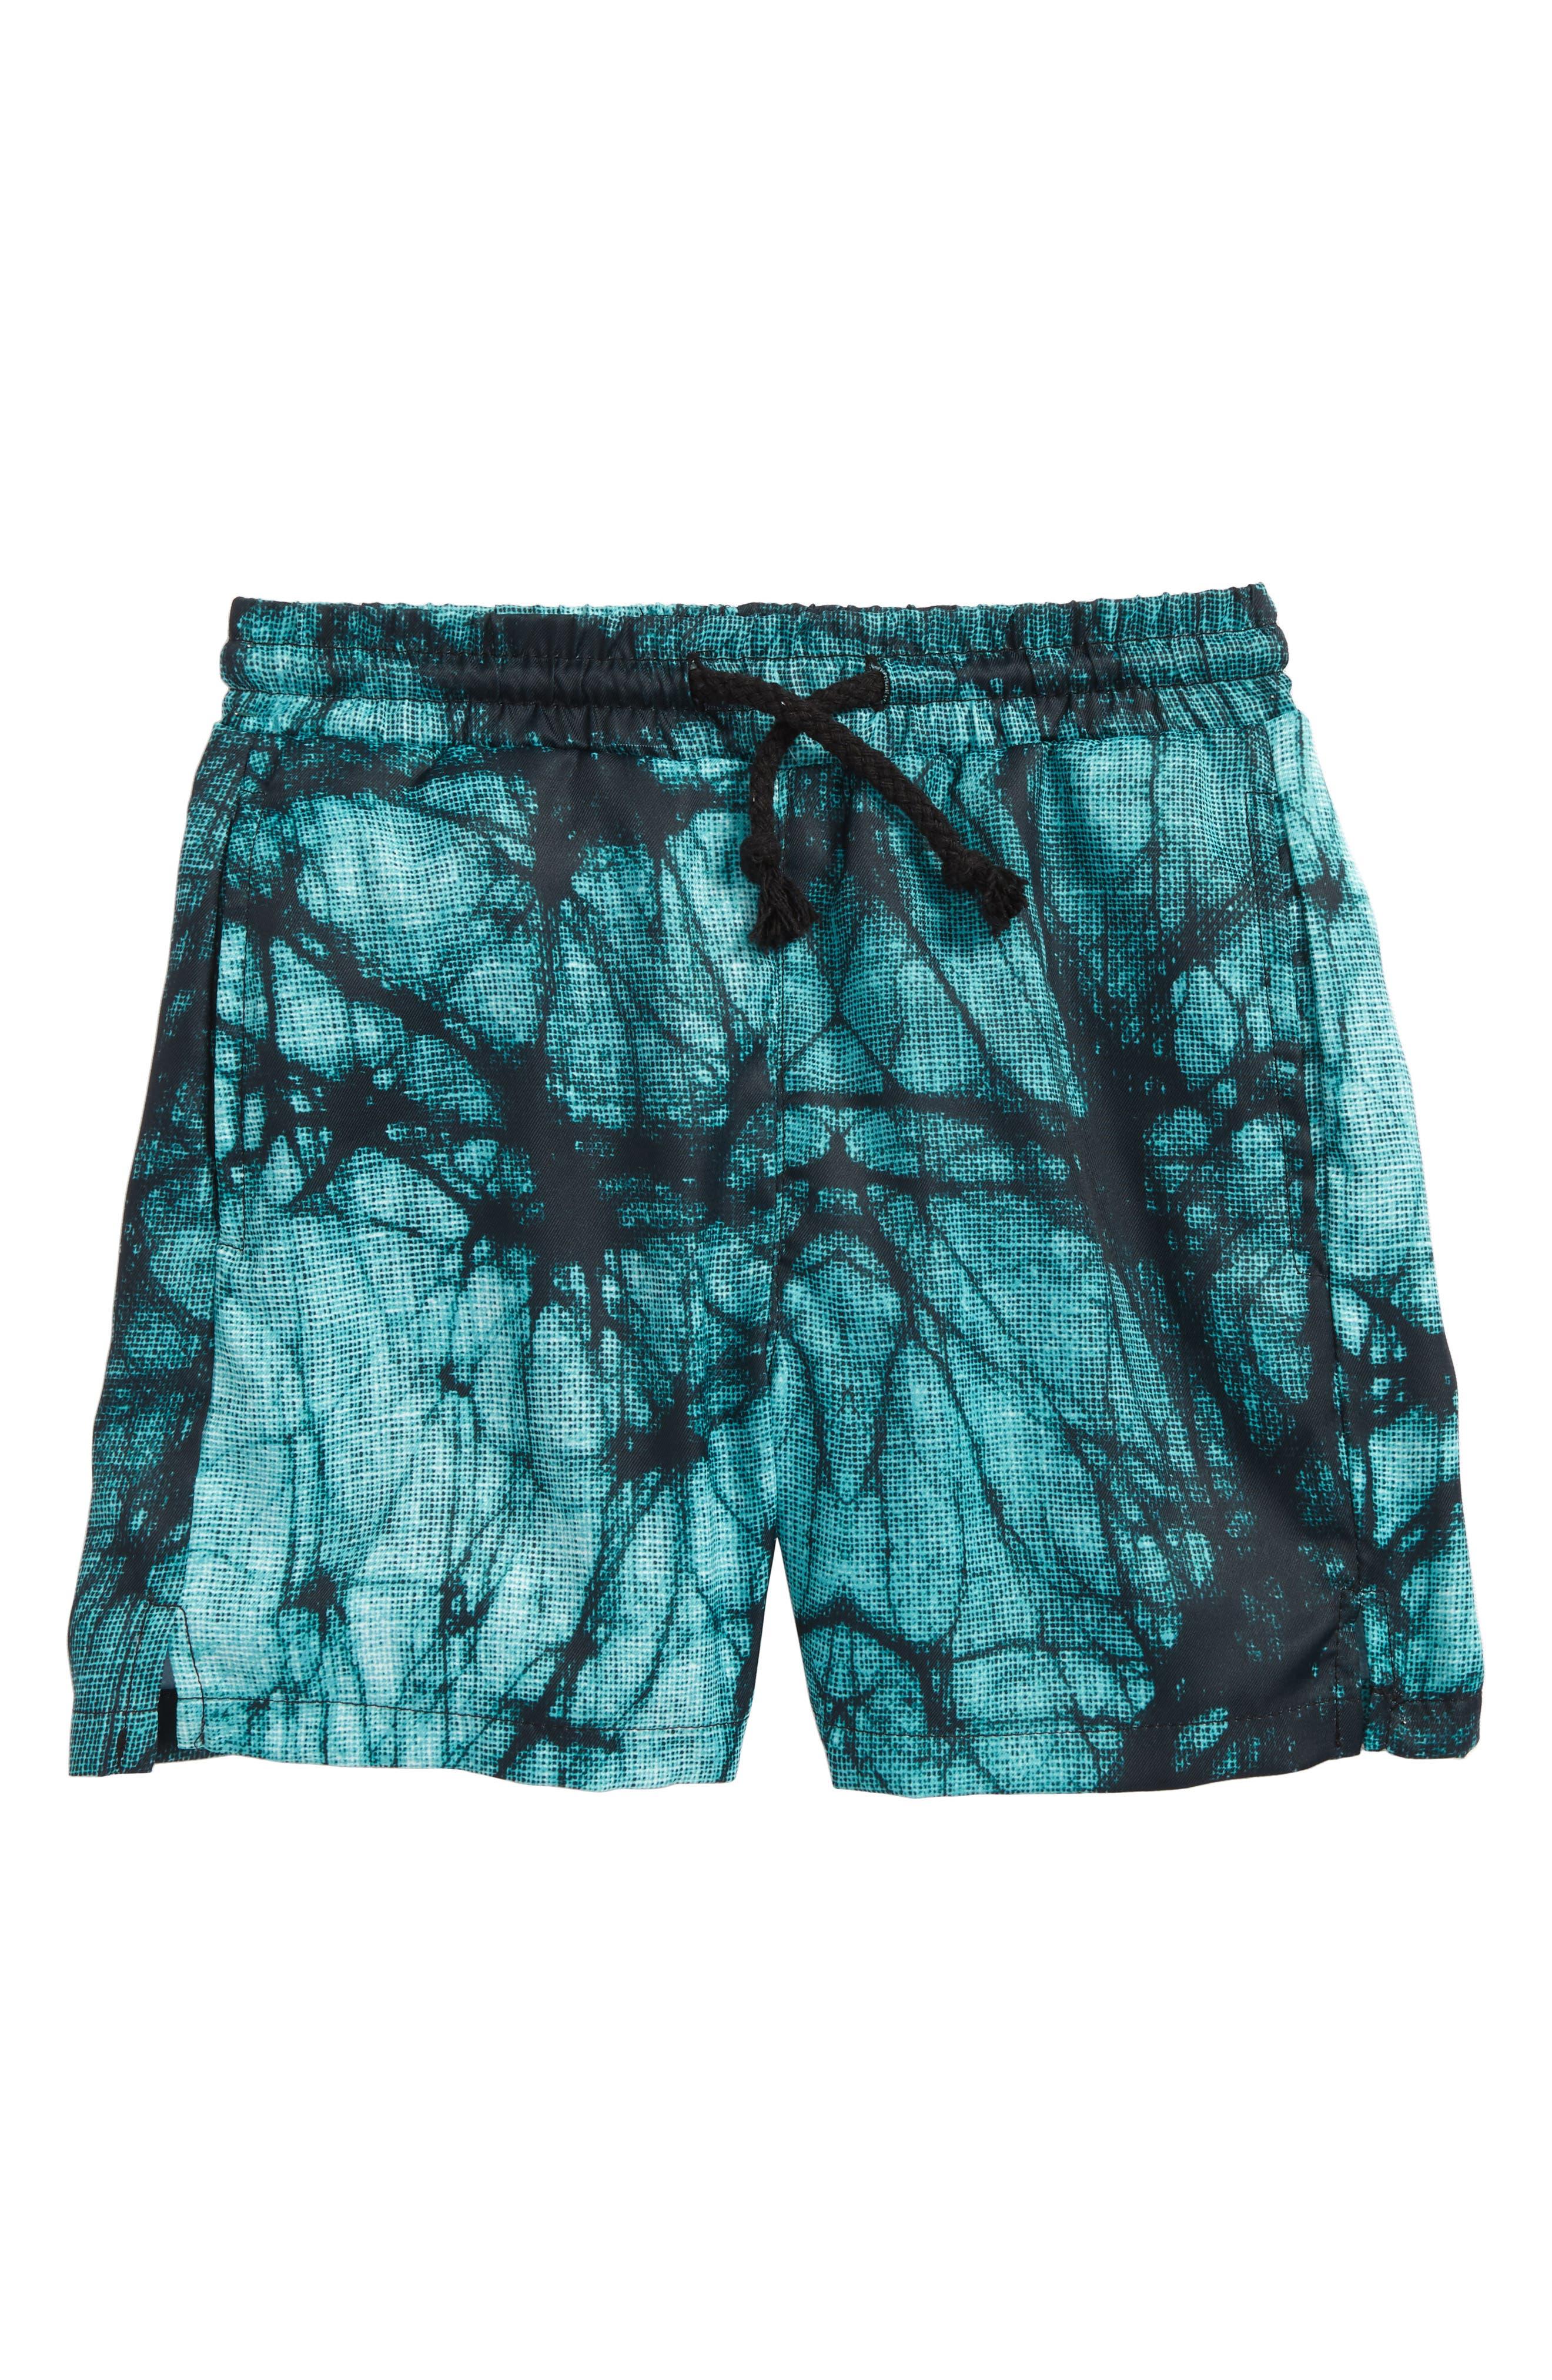 Splash Swim Trunks,                         Main,                         color, Aqua